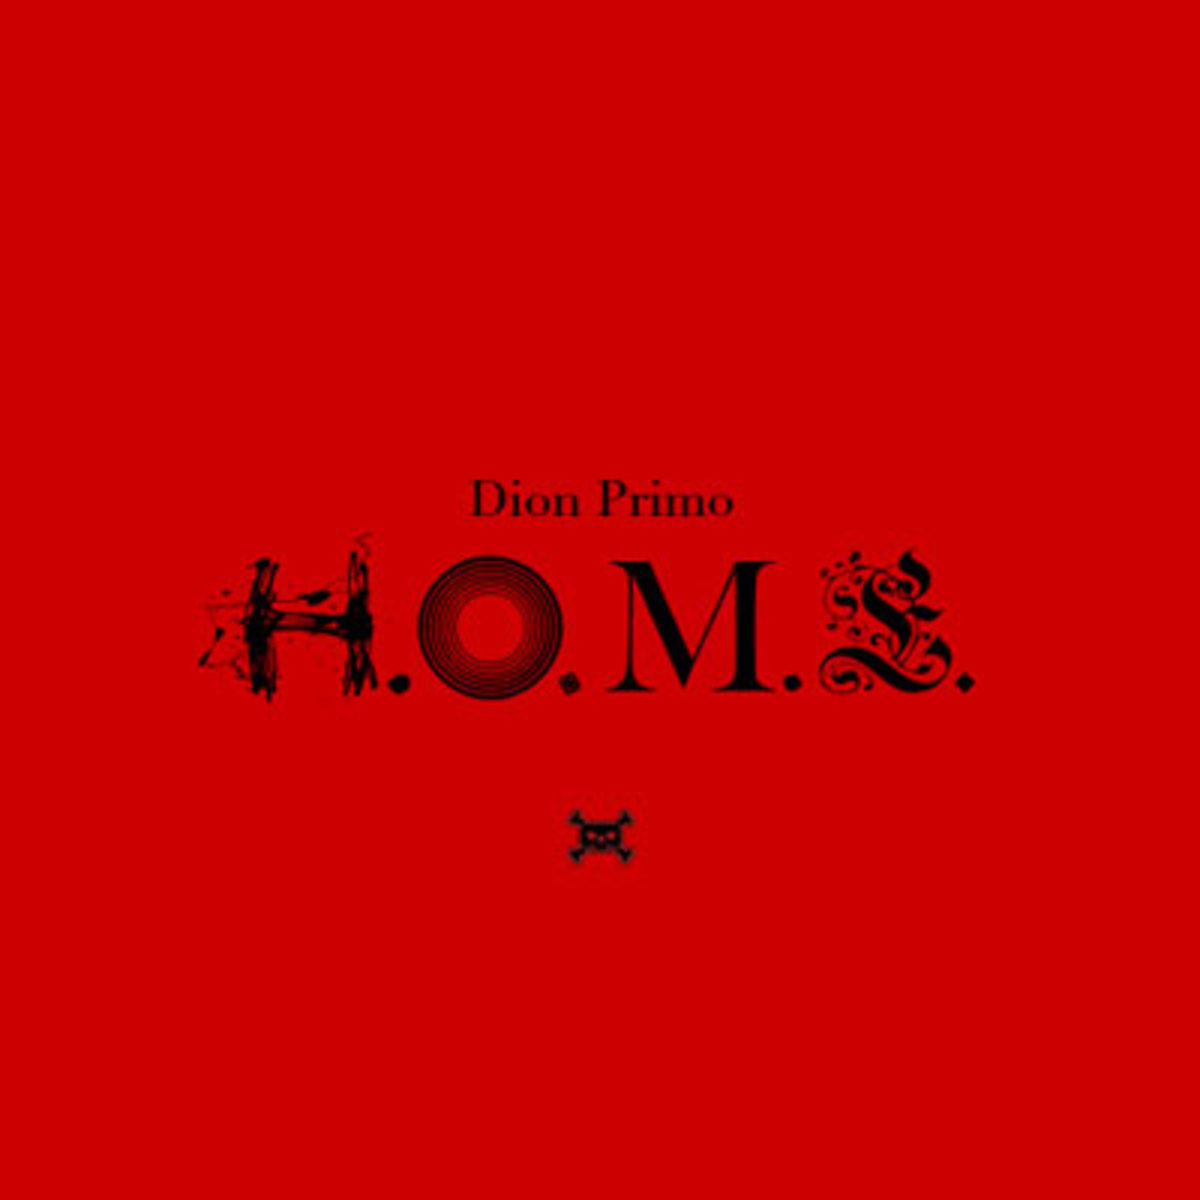 dionprimo-home.jpg